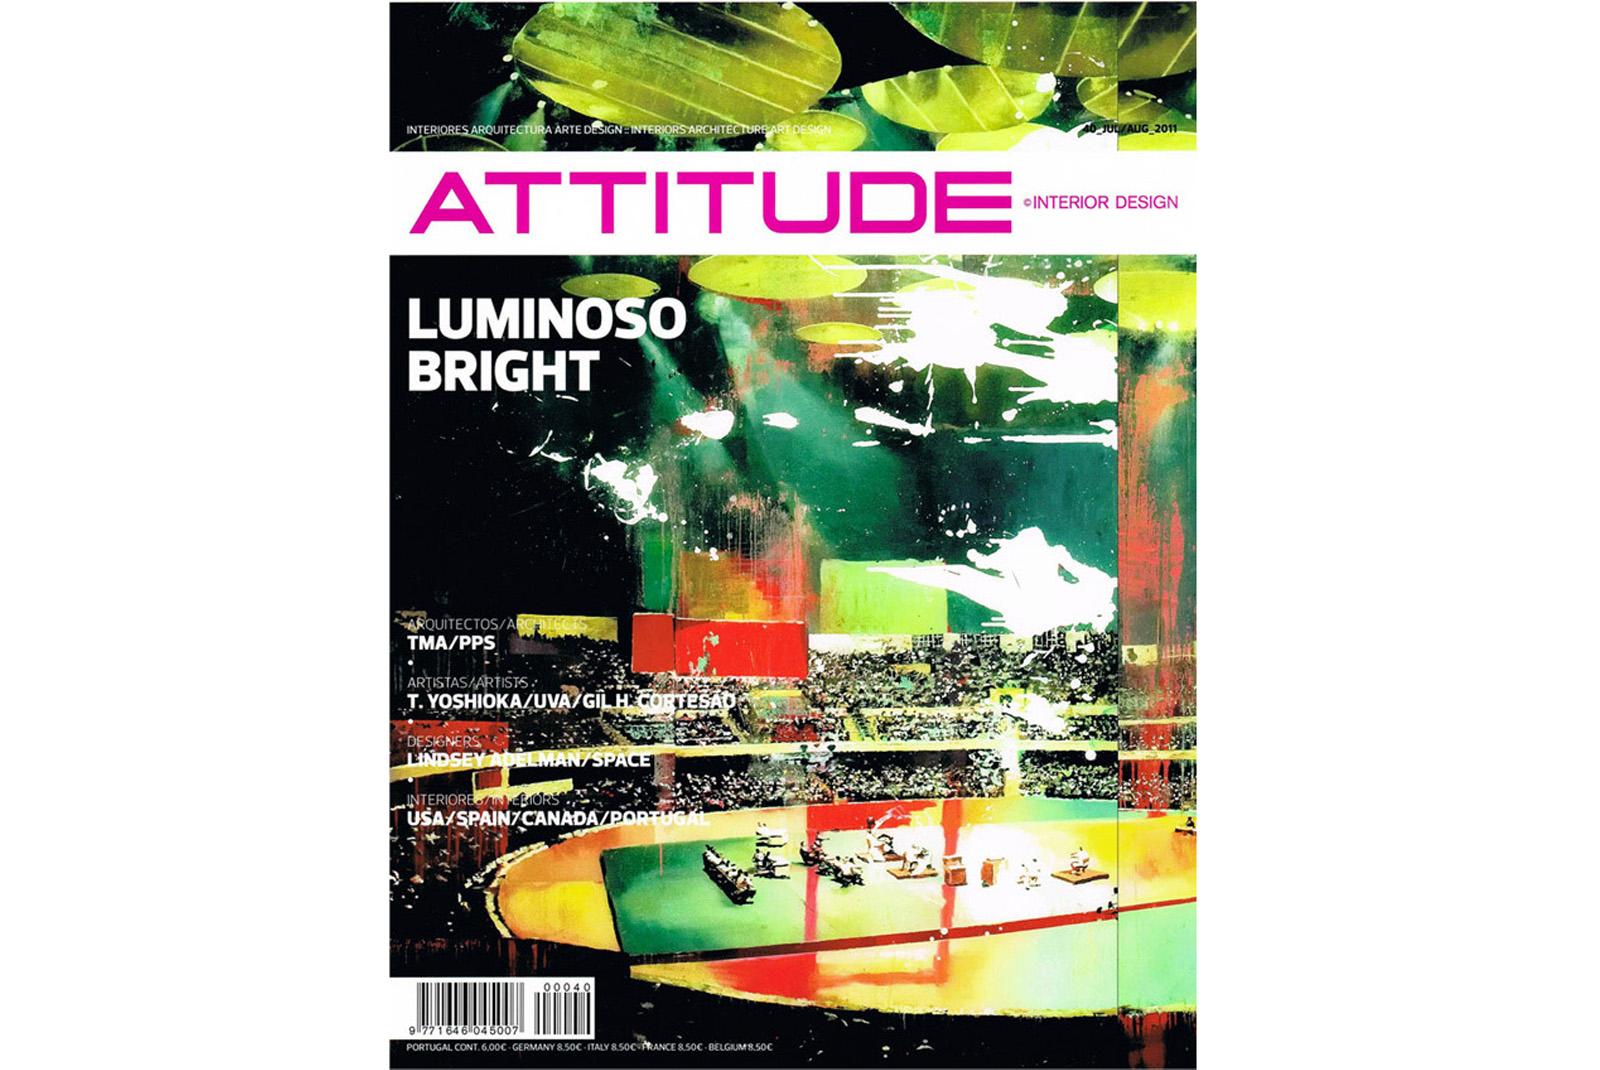 Attitude-pag1